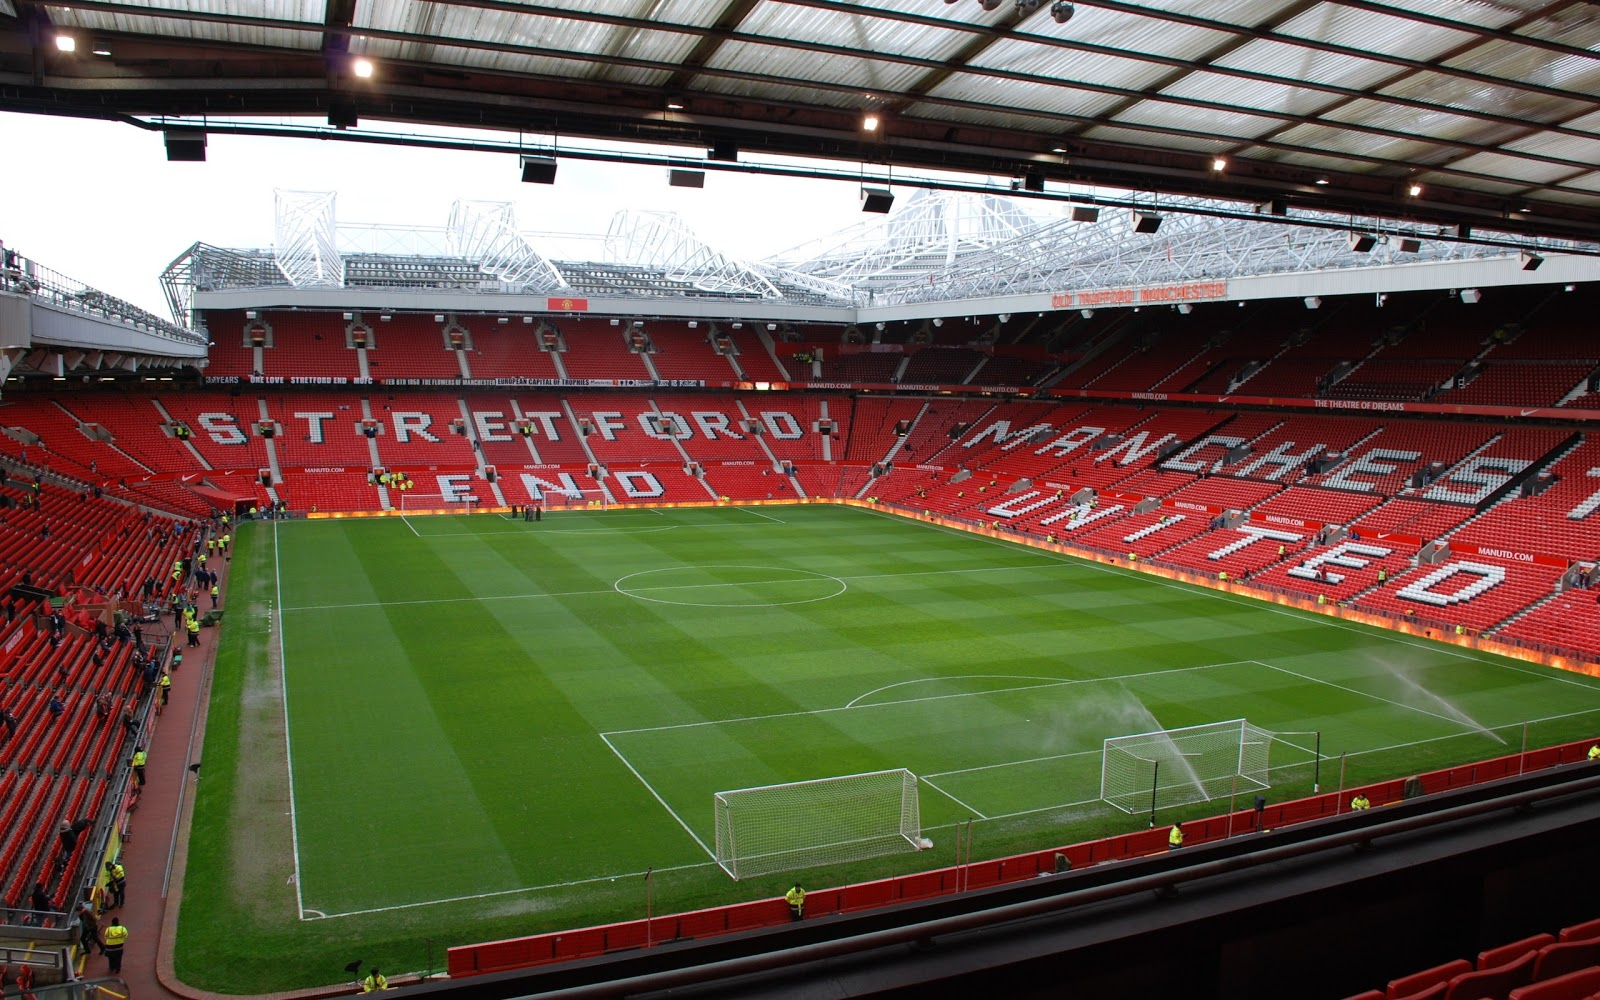 http://4.bp.blogspot.com/-FXfYEFz2FGQ/UIwiLQF8xvI/AAAAAAAADhU/_yrGcw203V0/s1600/Manchester+United+Old+Tafford+Field+Wallpaper.jpg